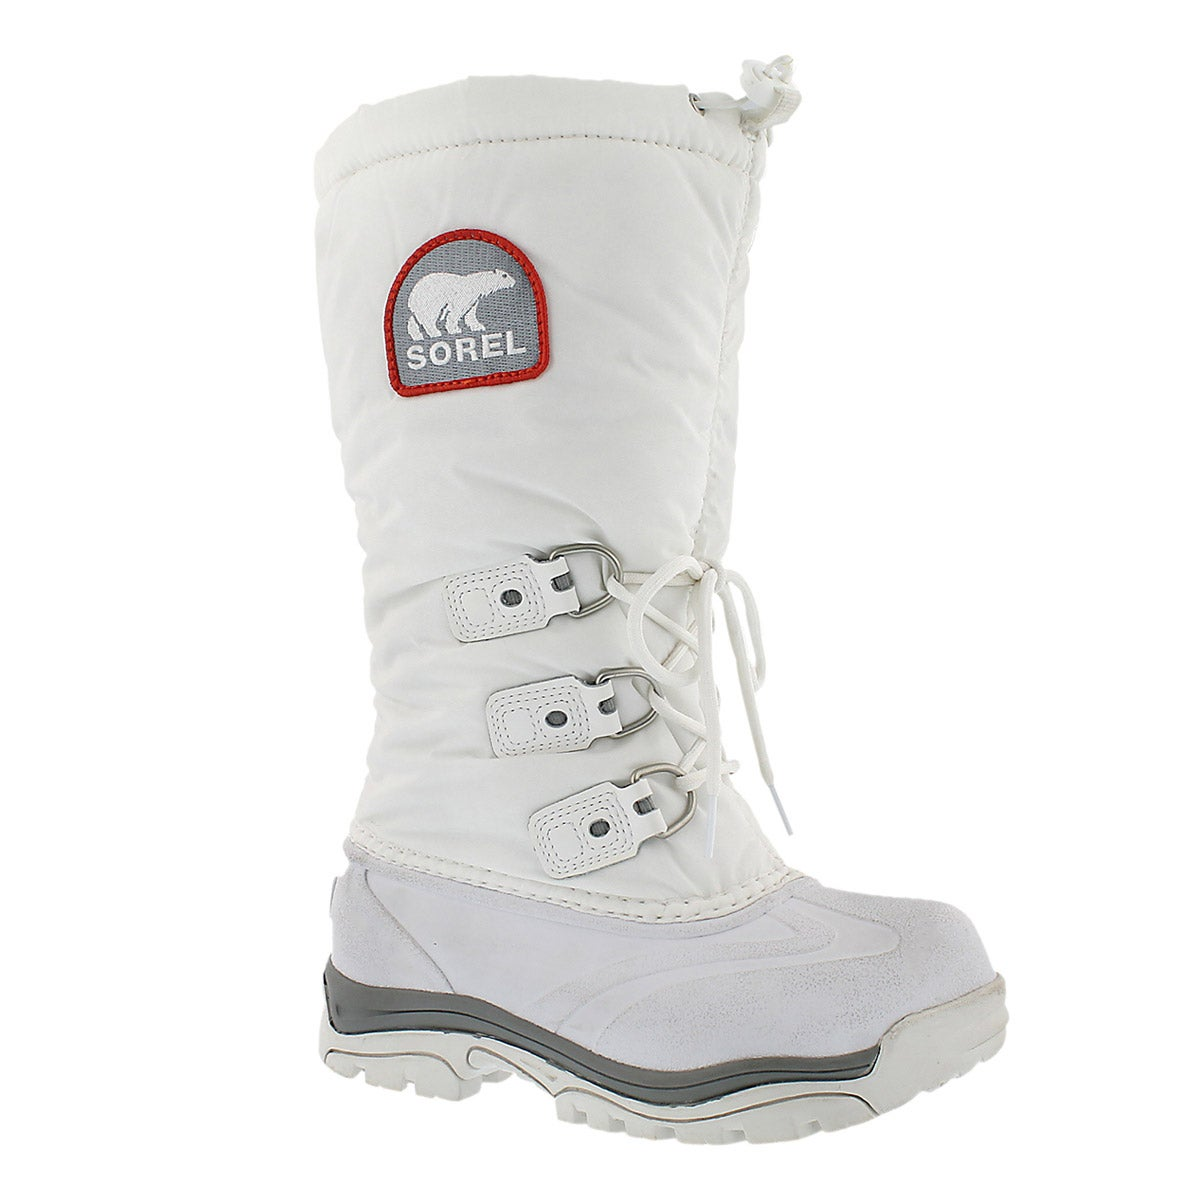 Women's SNOWLION XT white winter boots